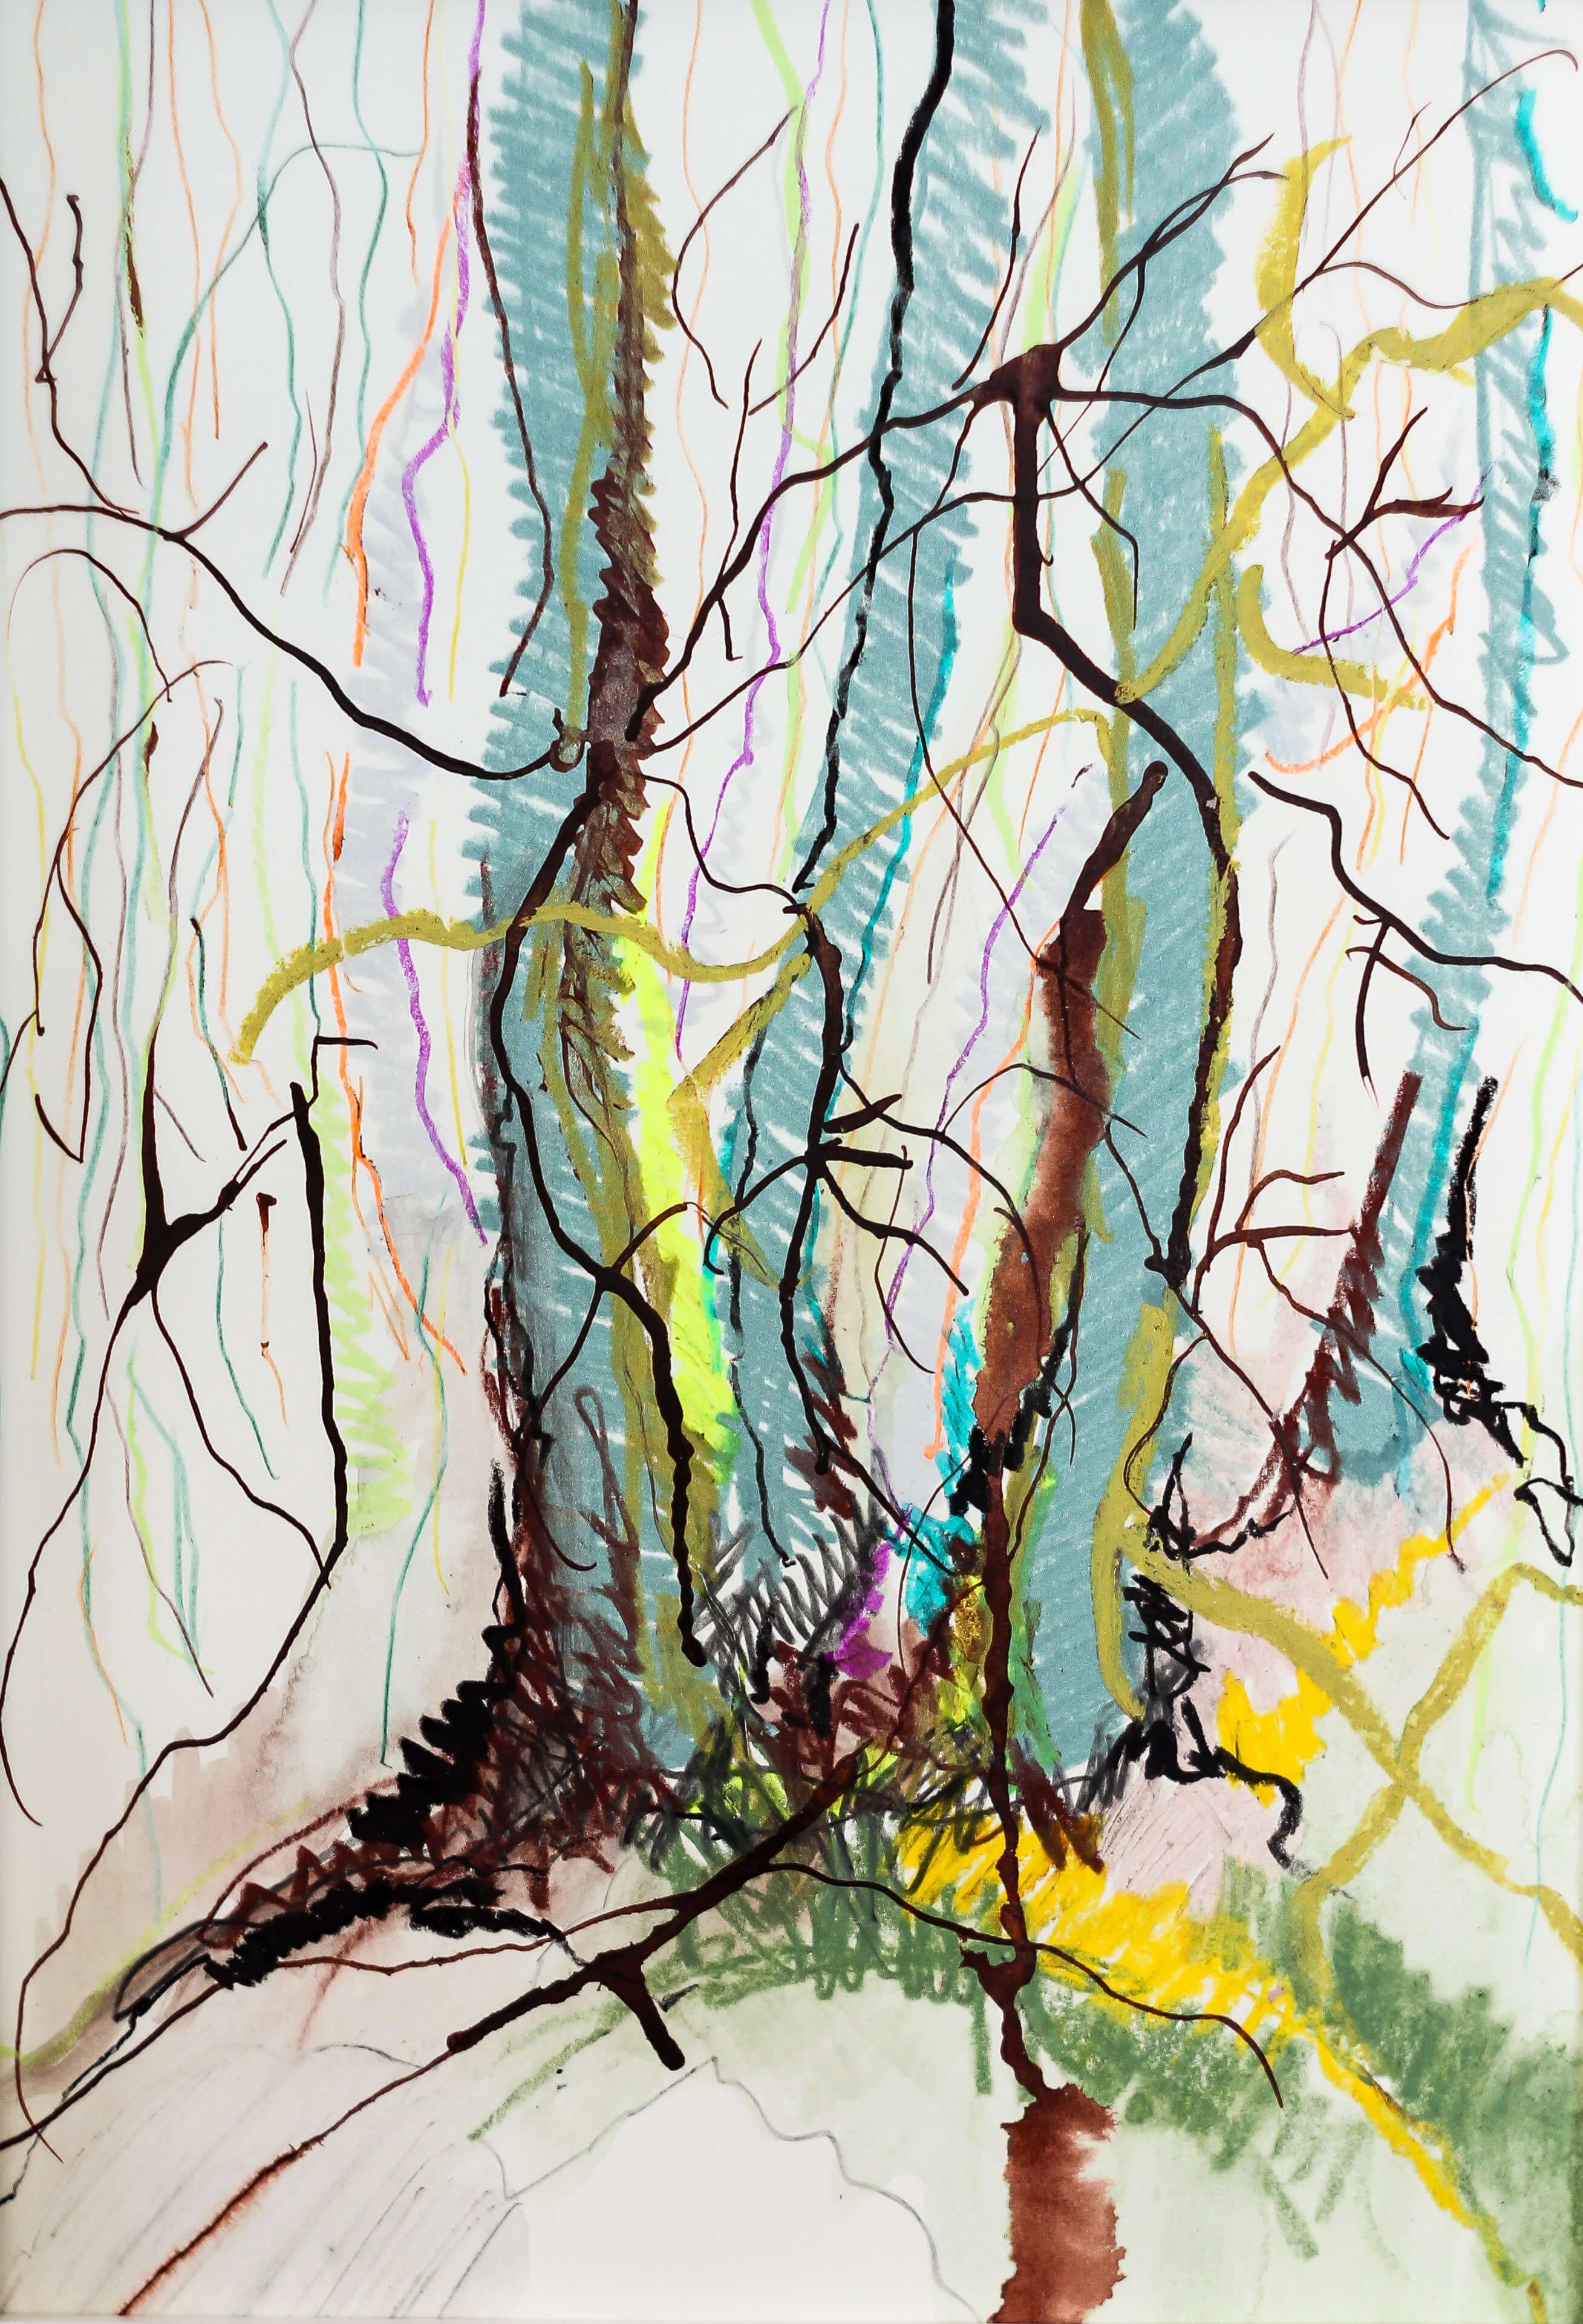 Katharina Albers, Wald VIII, 2014, Ölkreide, Tusche, Aquarell, Graphit auf Papier, 29,7×21 cm